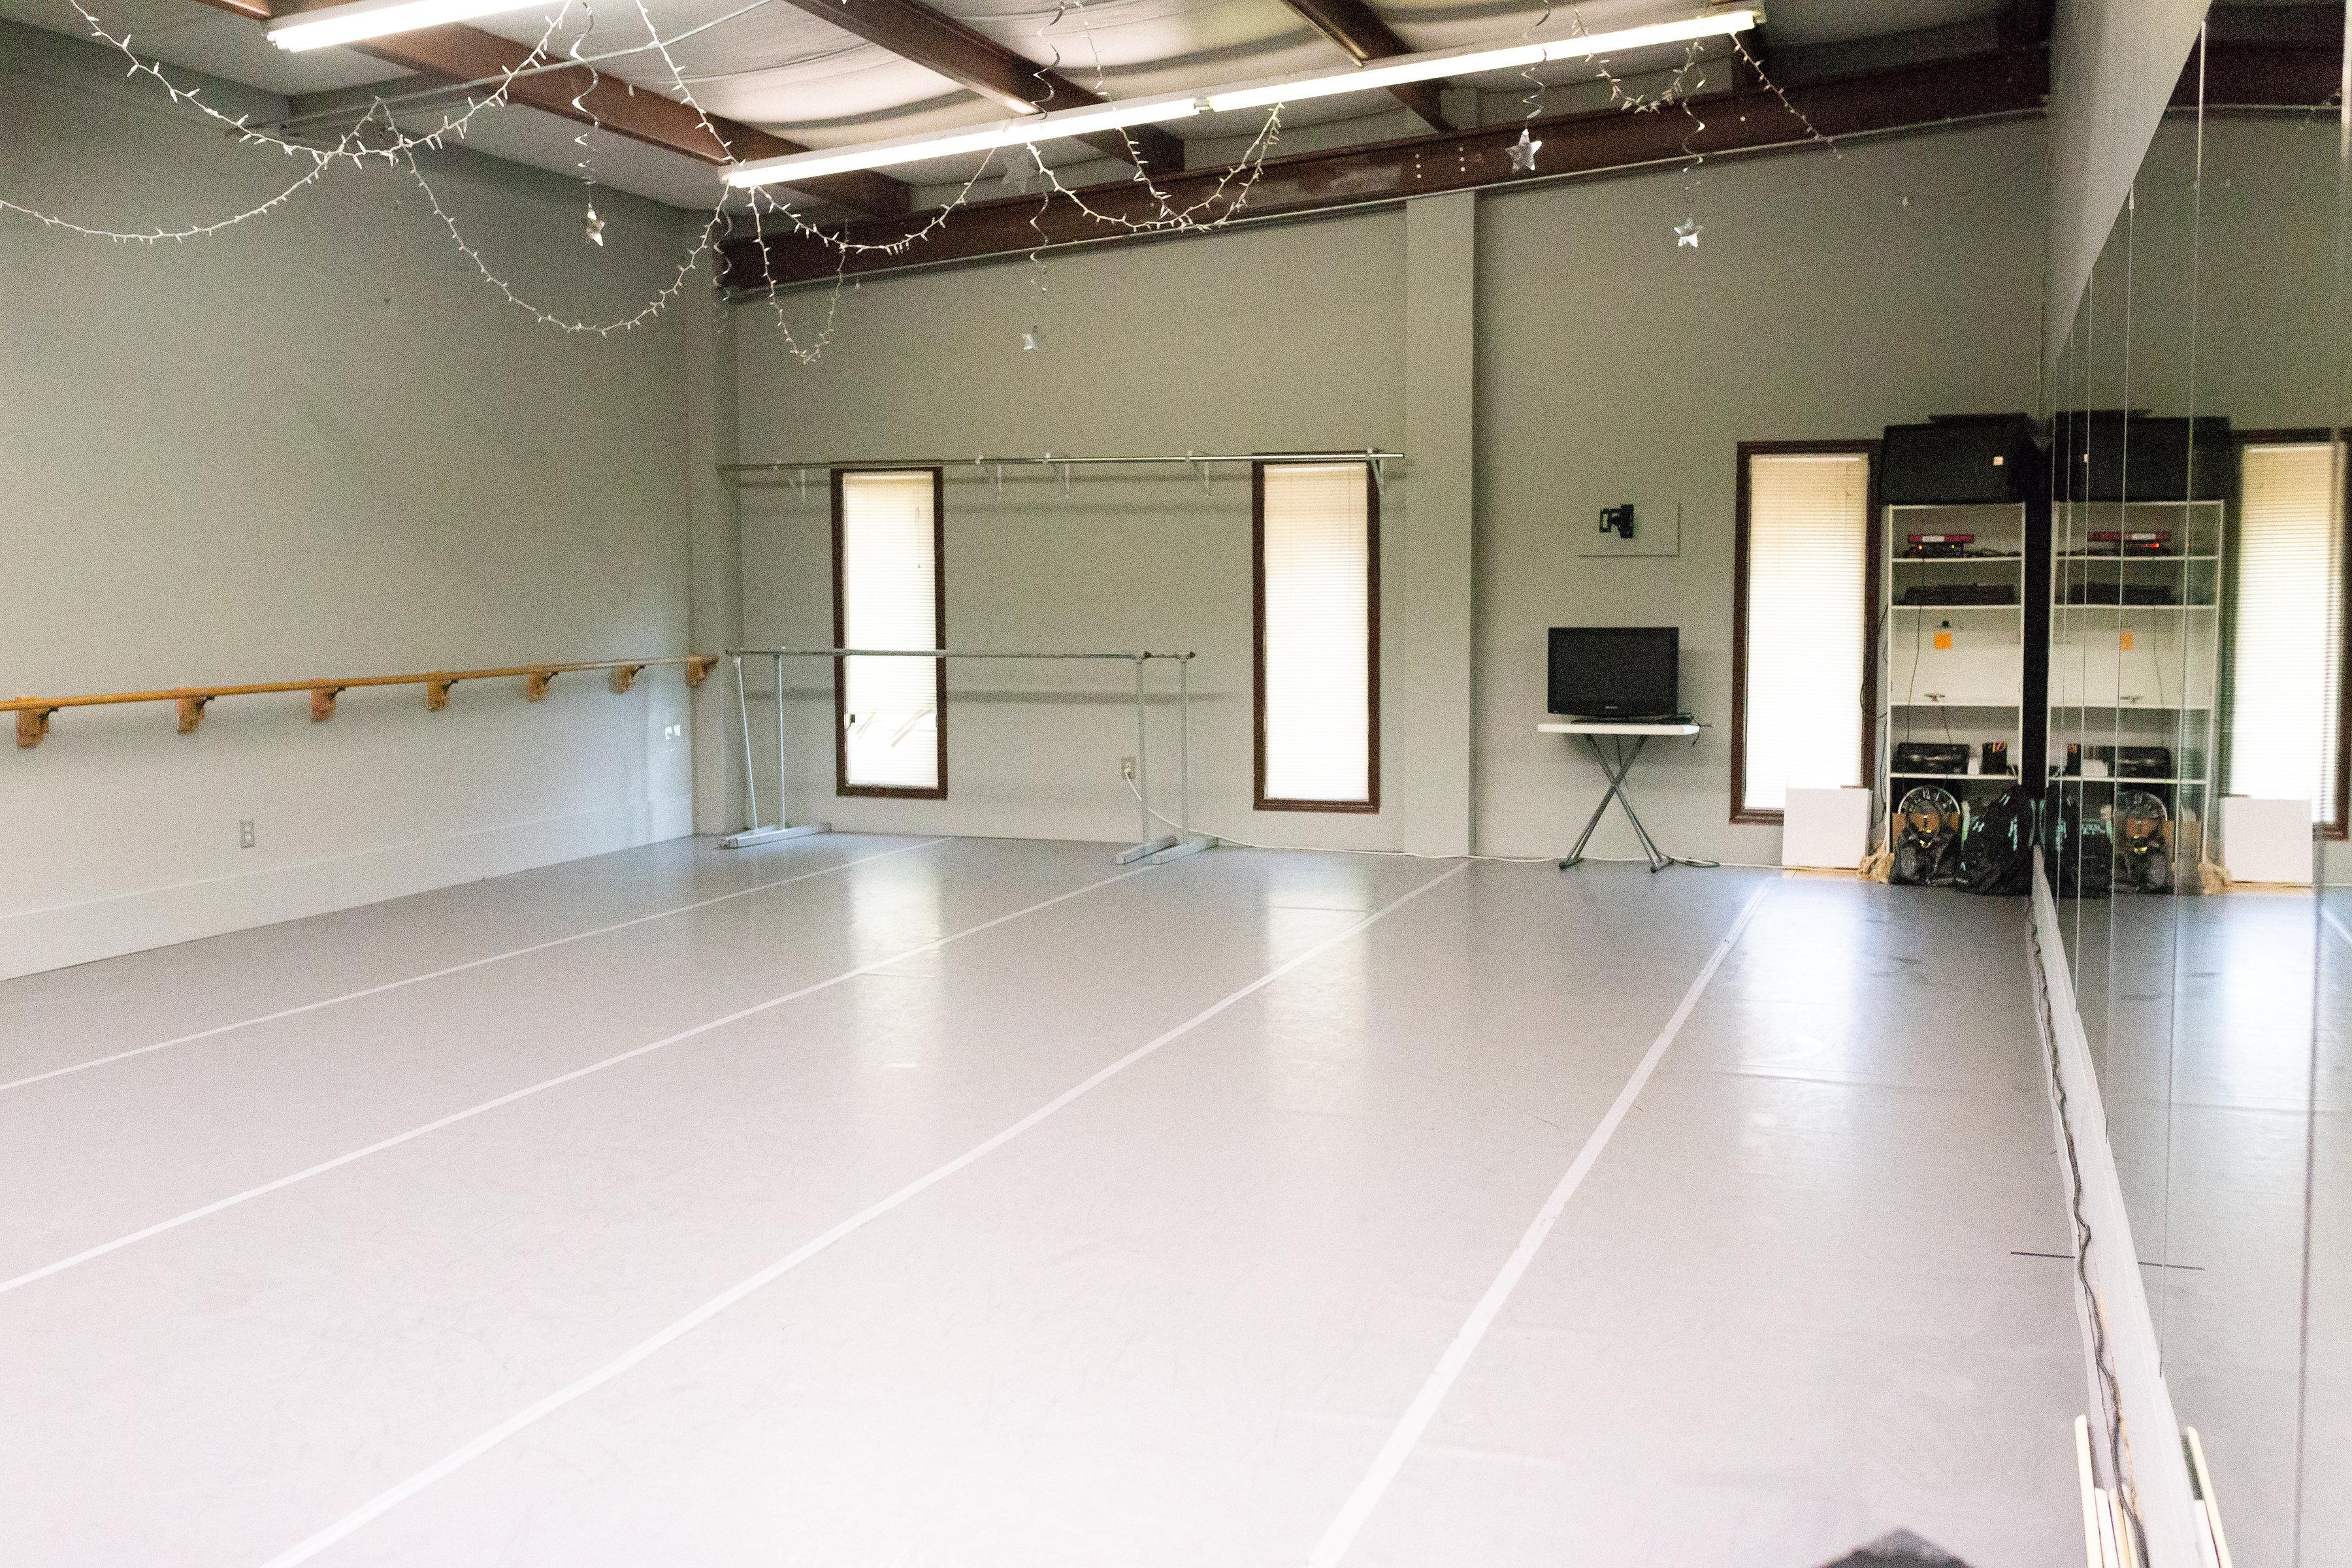 wesmark dance studio inside